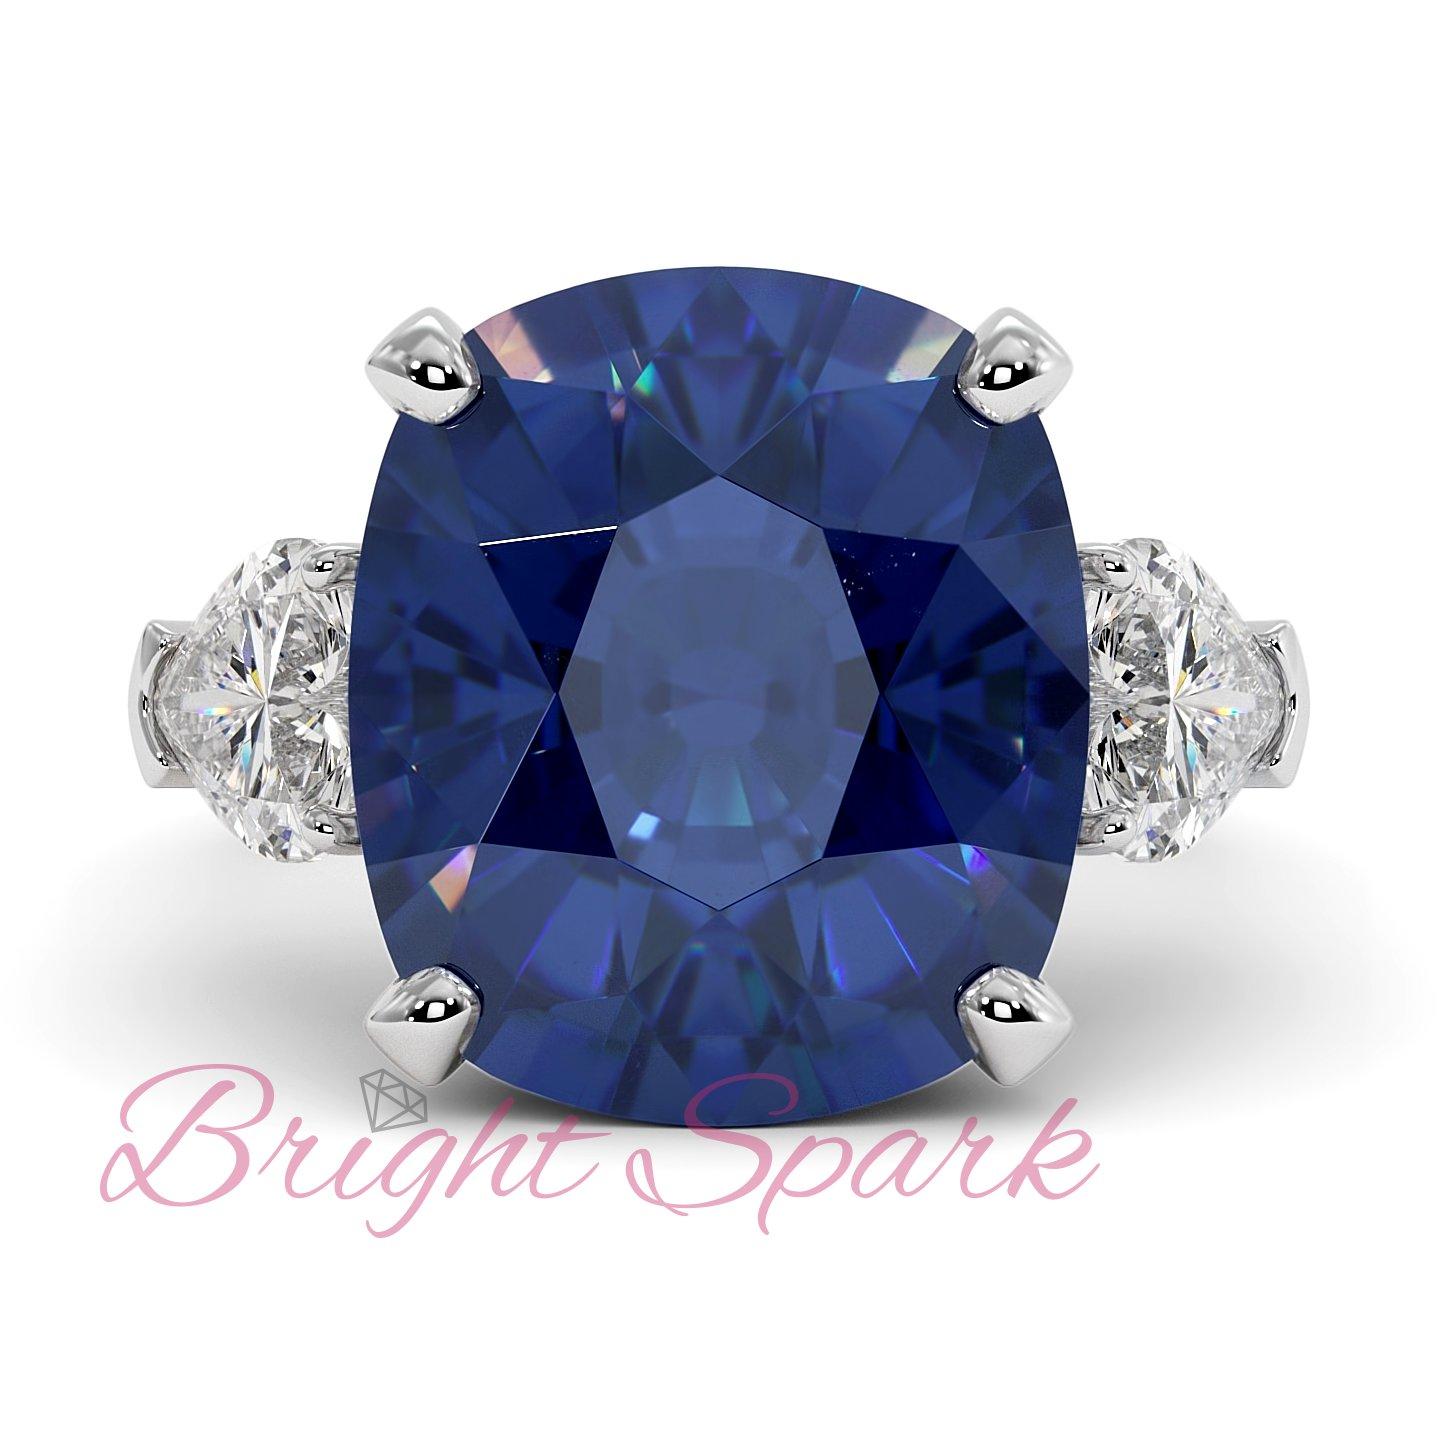 Кольцо с синим сапфиром кушон и камнями сердце Whitney 16,5 карат